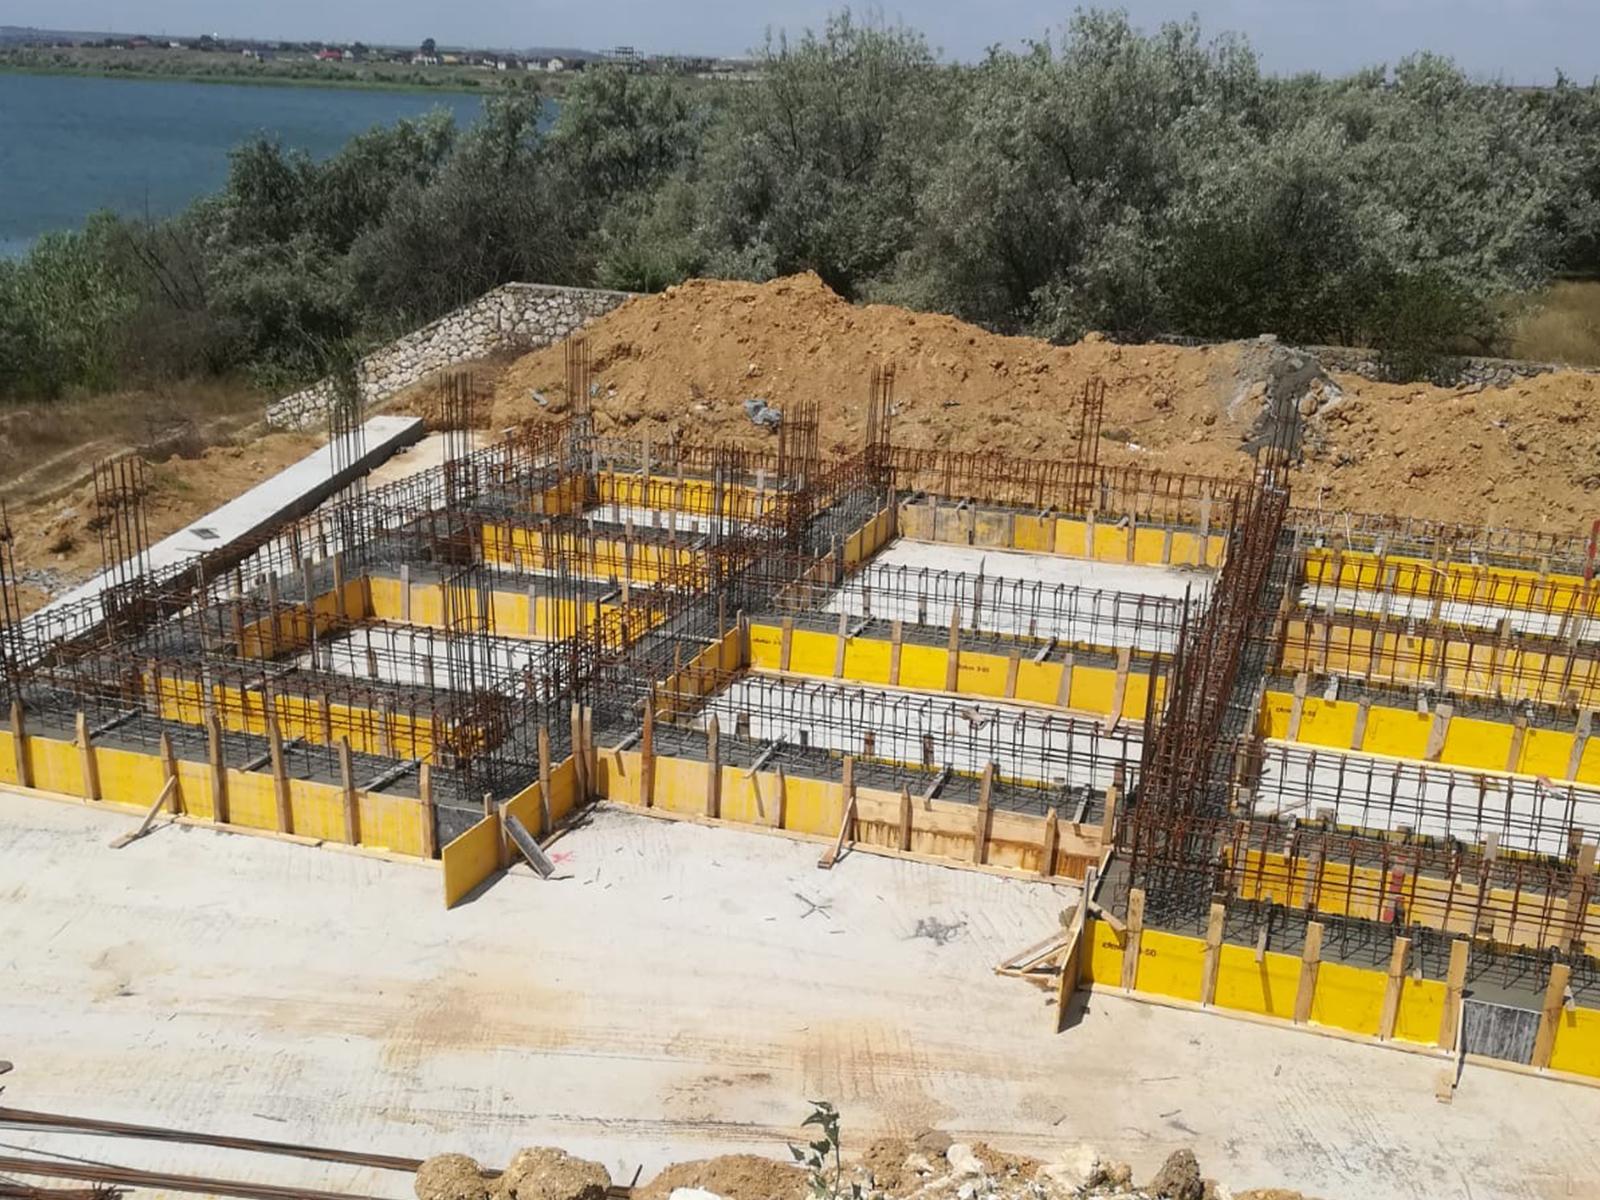 etapa-7-1-proiect-rya-lago-constanta-mamaia